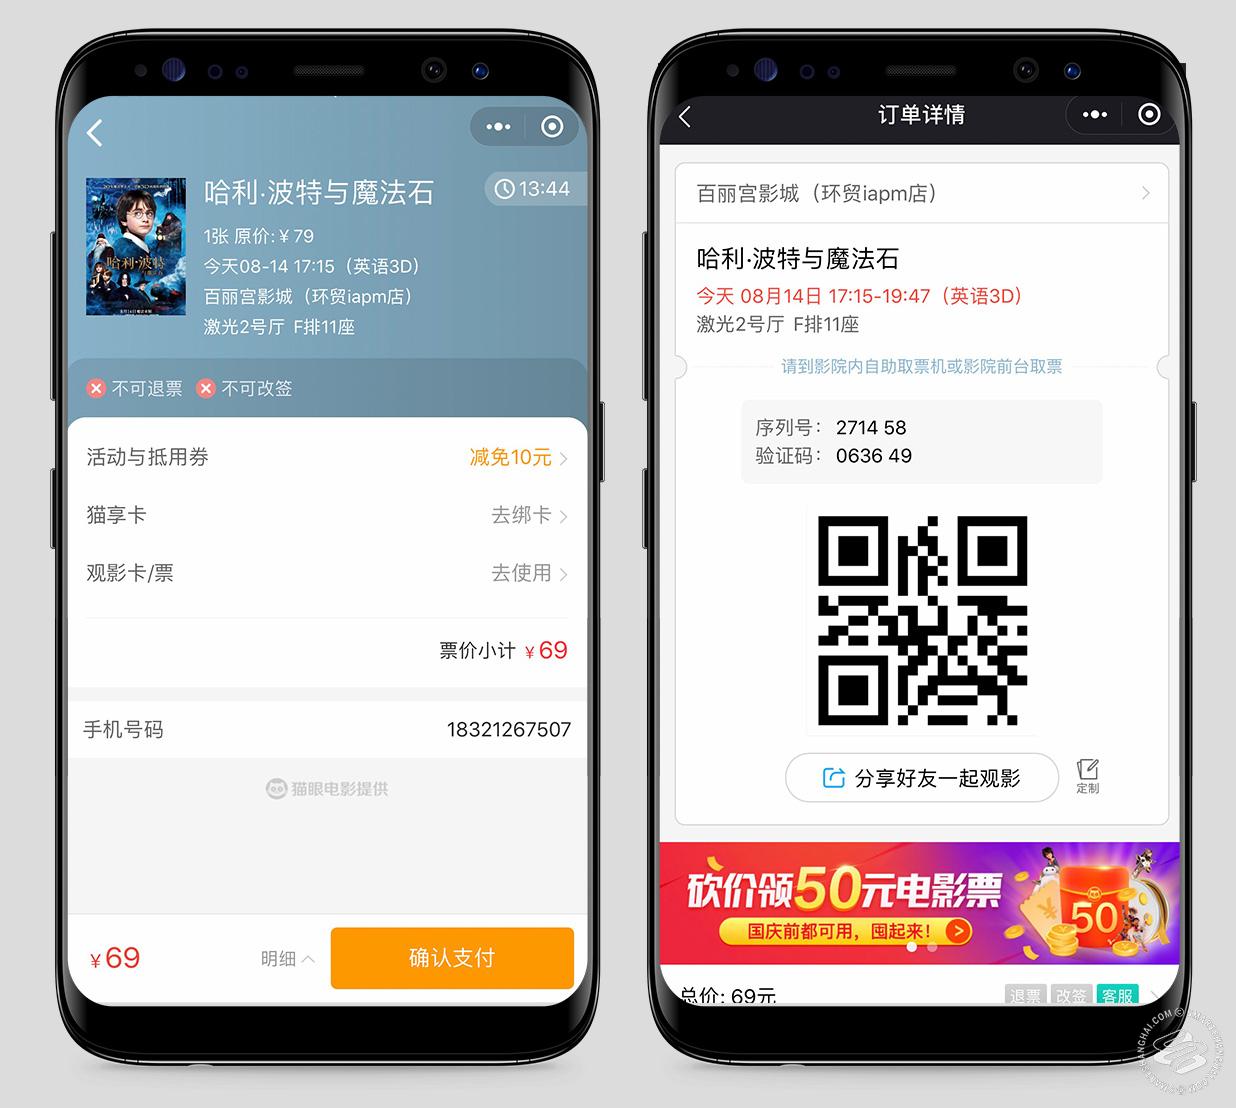 Digital Ticket Shanghai